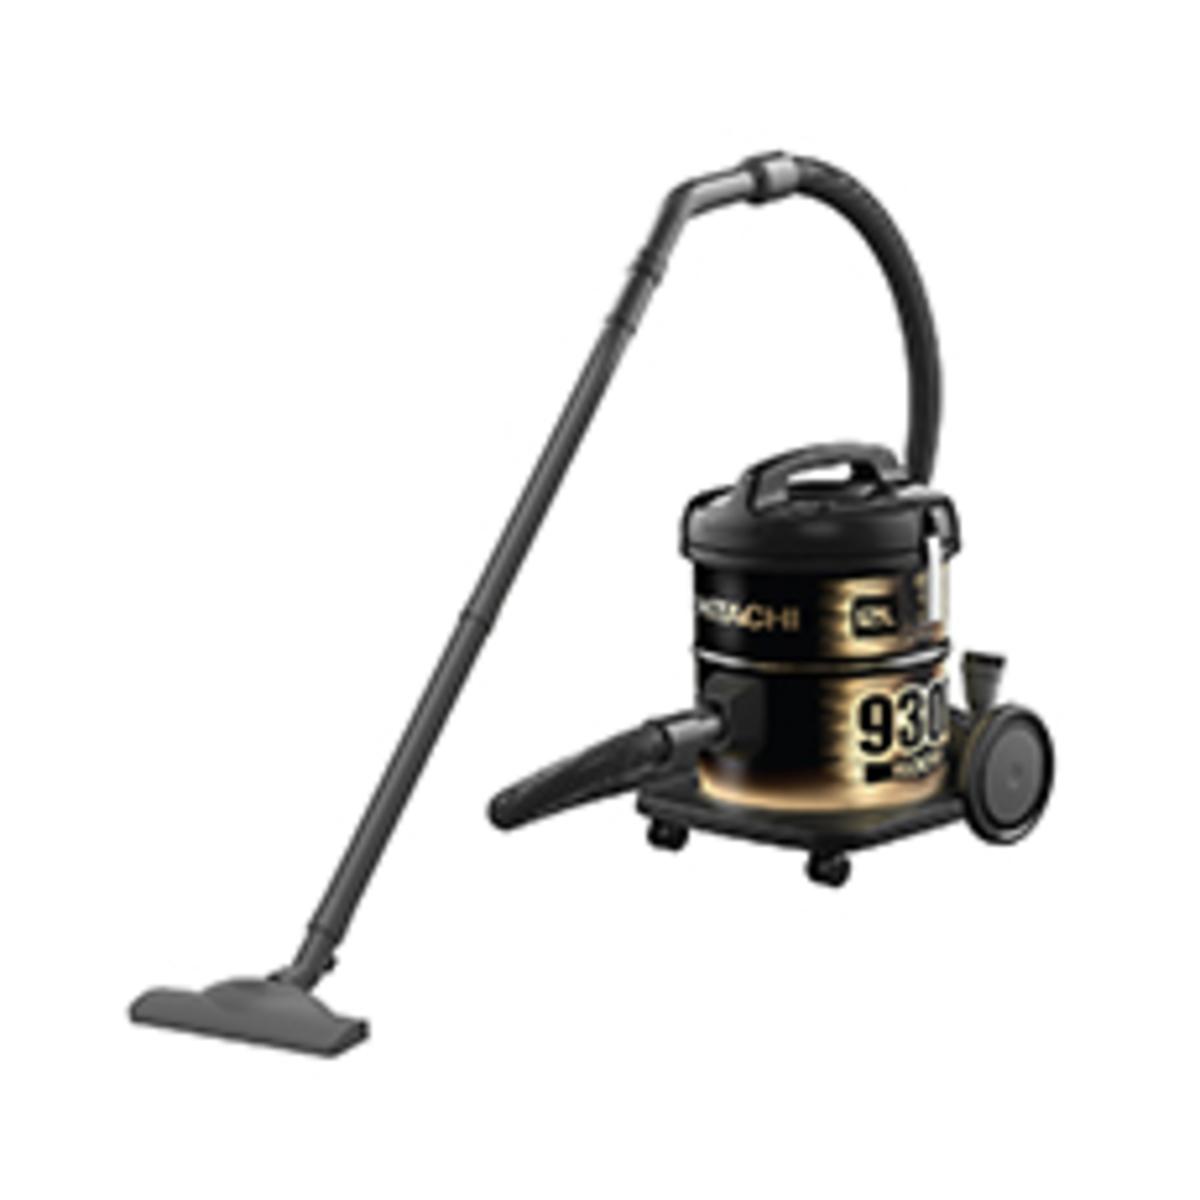 Commercial Vacuum Cleaner CV930F